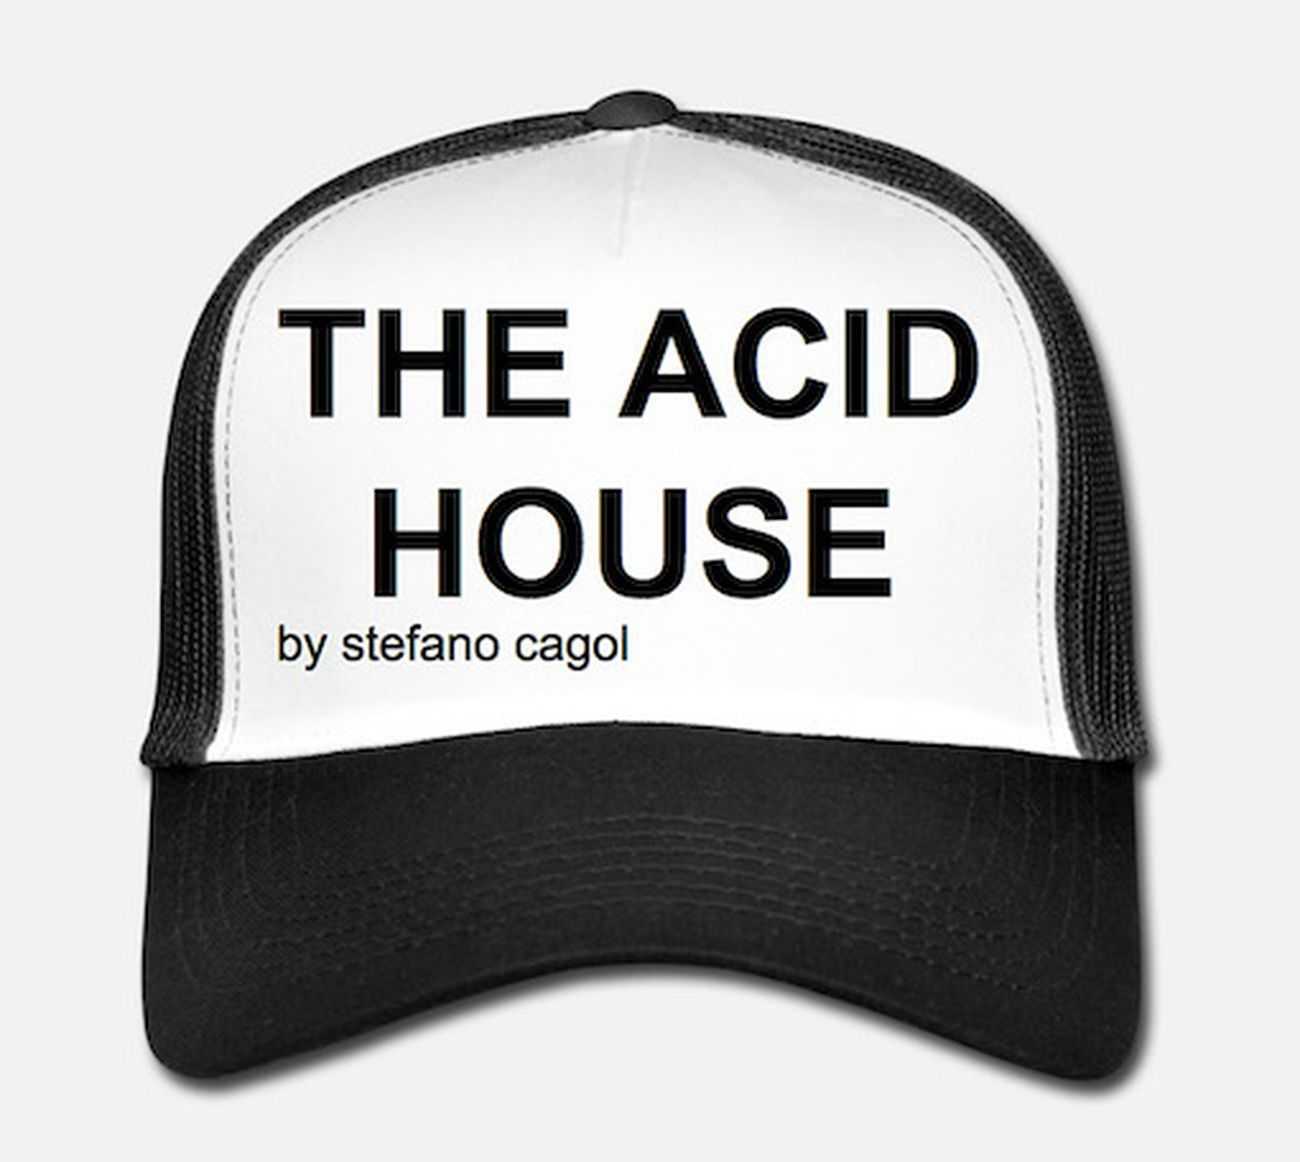 Stefano Cagol, The Acid House (Litmus Test), 2019